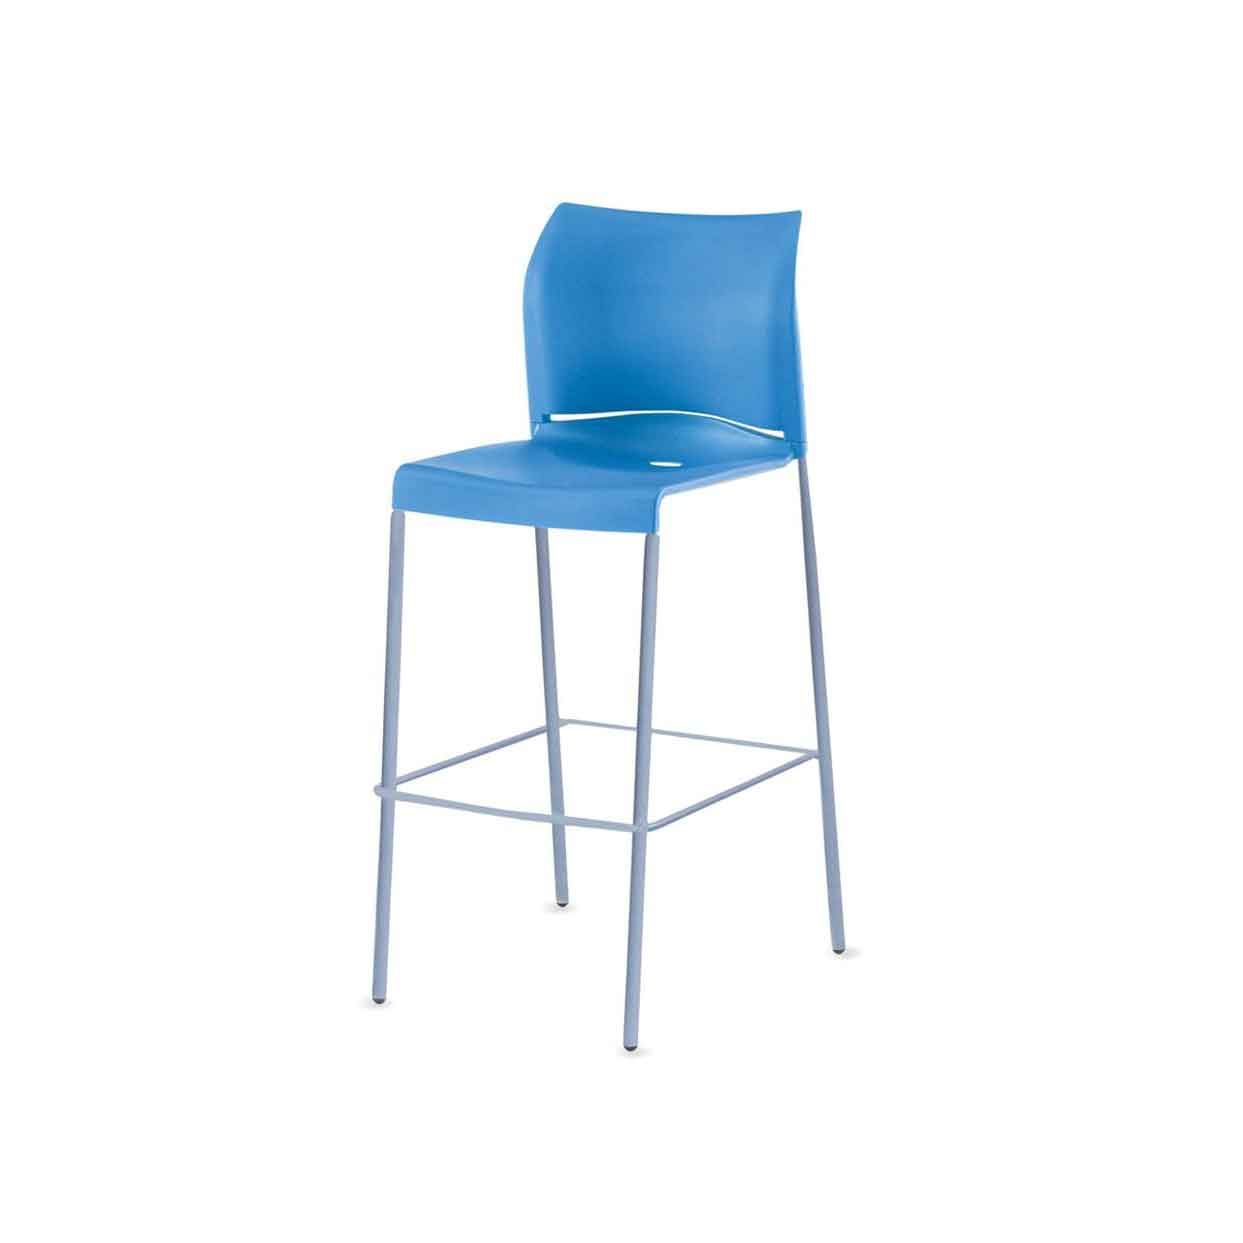 Muebles en azul tattoo design bild - Outlet muebles hogar y decoracion madrid ...